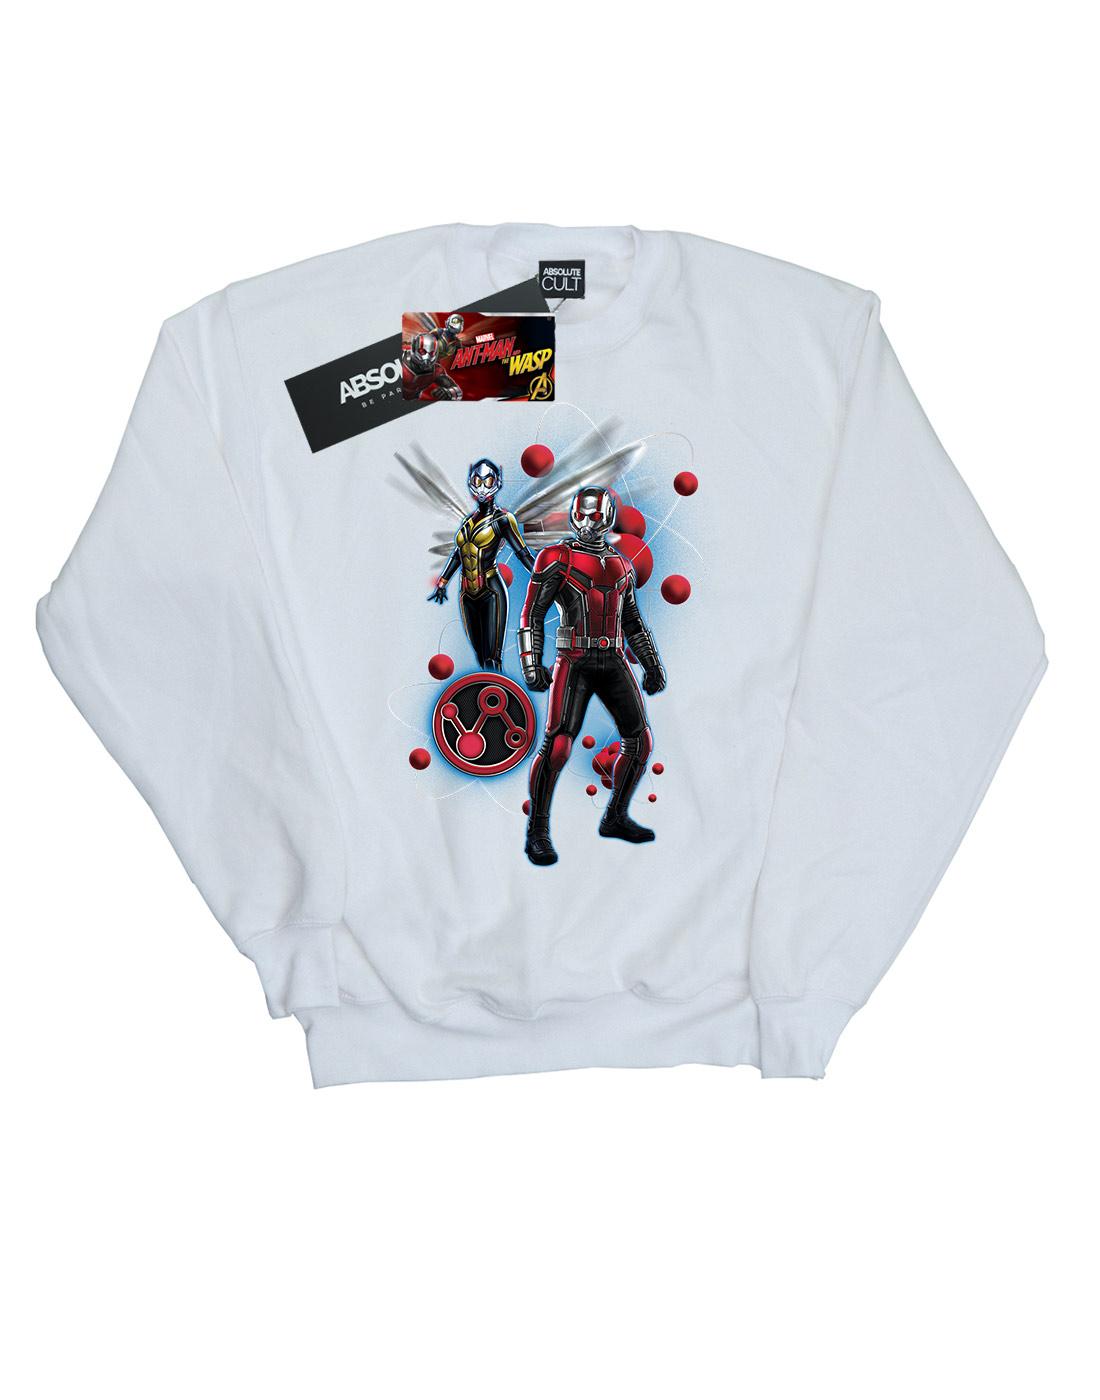 The Uomo Felpa e Particle Ant Wasp man Pose Marvel wISxaI